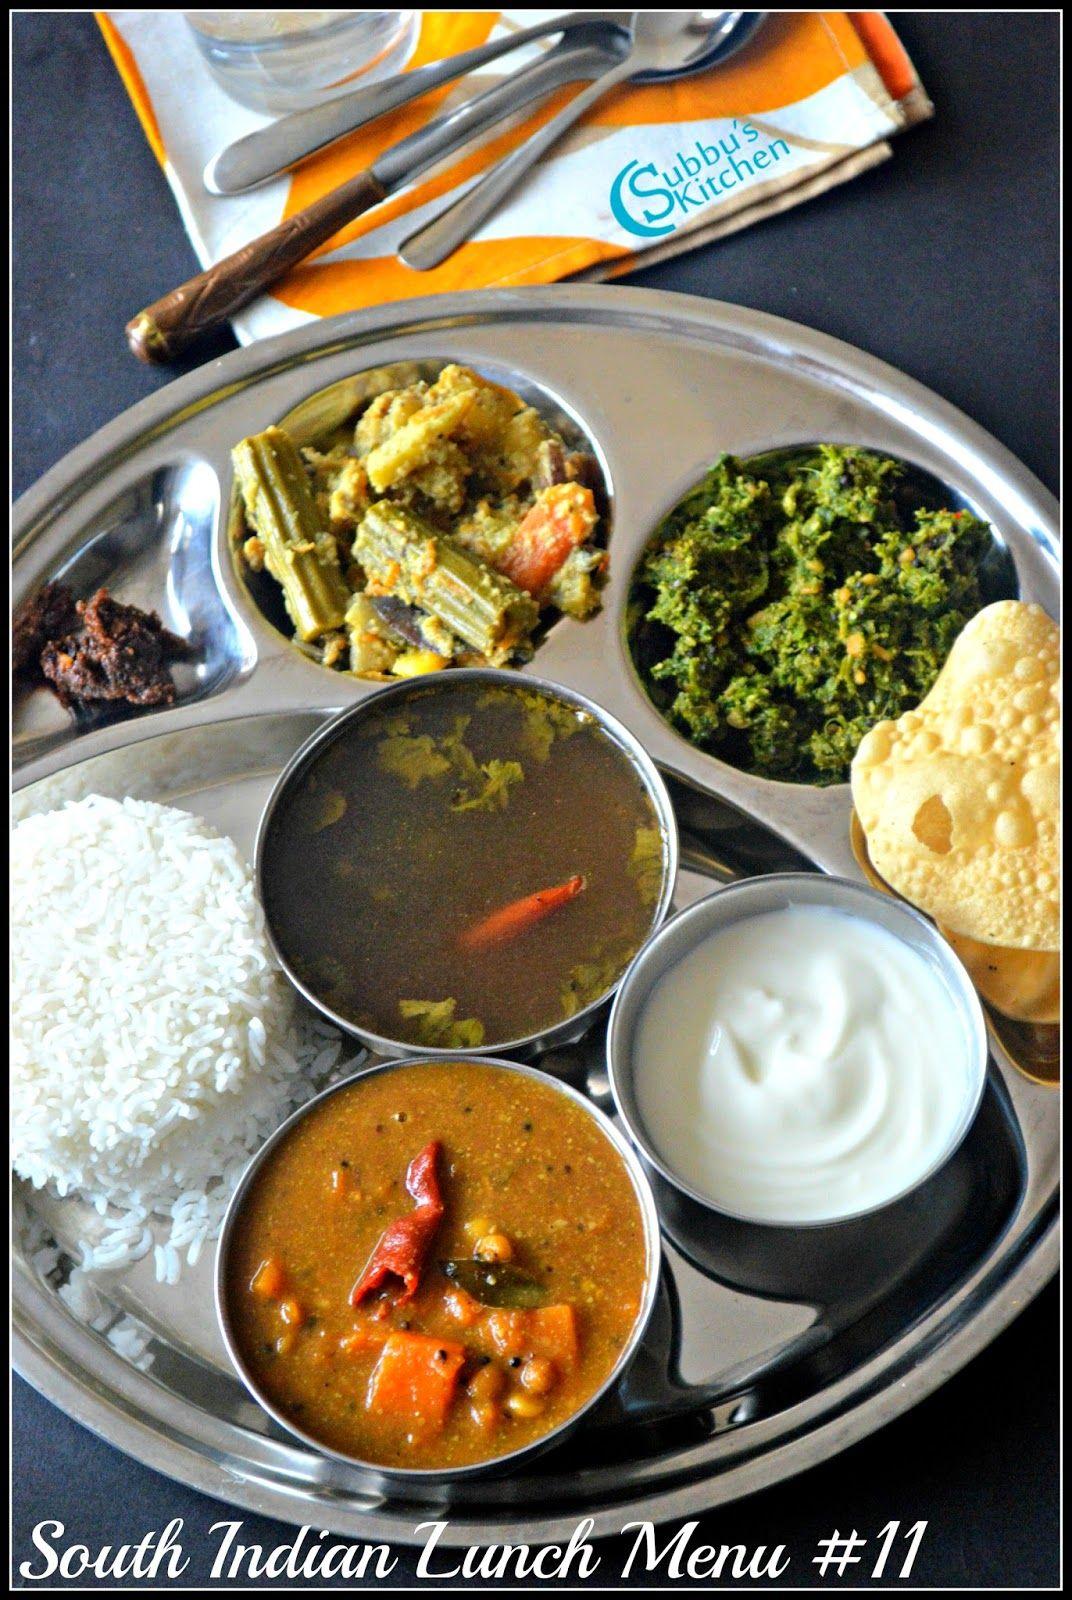 South Indian Lunch Menu 11 Parangikai Puli Kuzhambu Aviyal